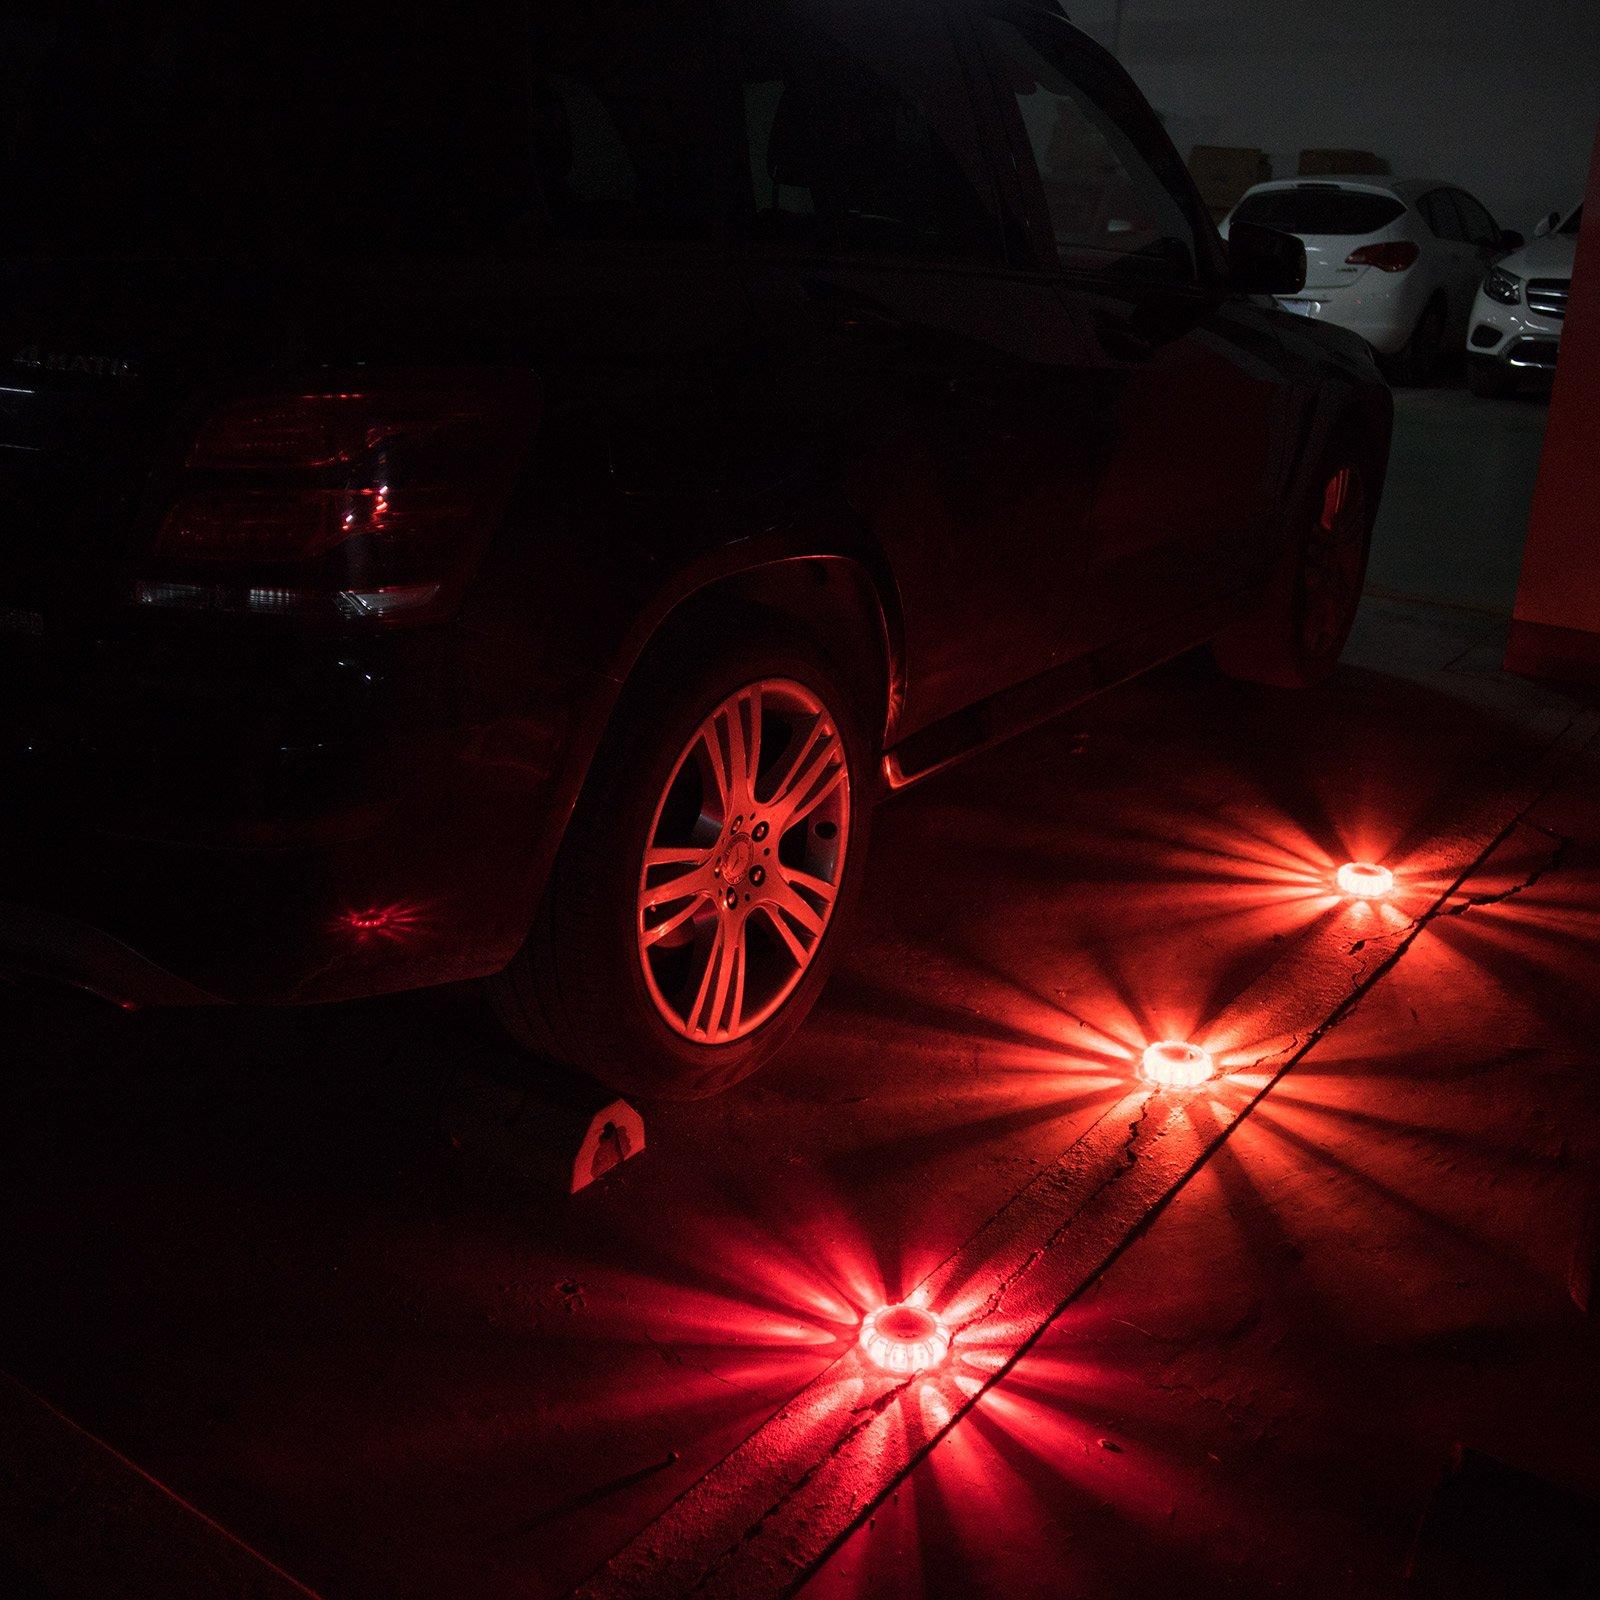 Magnetic Base for Car or Marine Boat W0228 SlimK 3 Pack LED Road Flares Flashing Warning Light Roadside Flare Emergency Disc Beacon